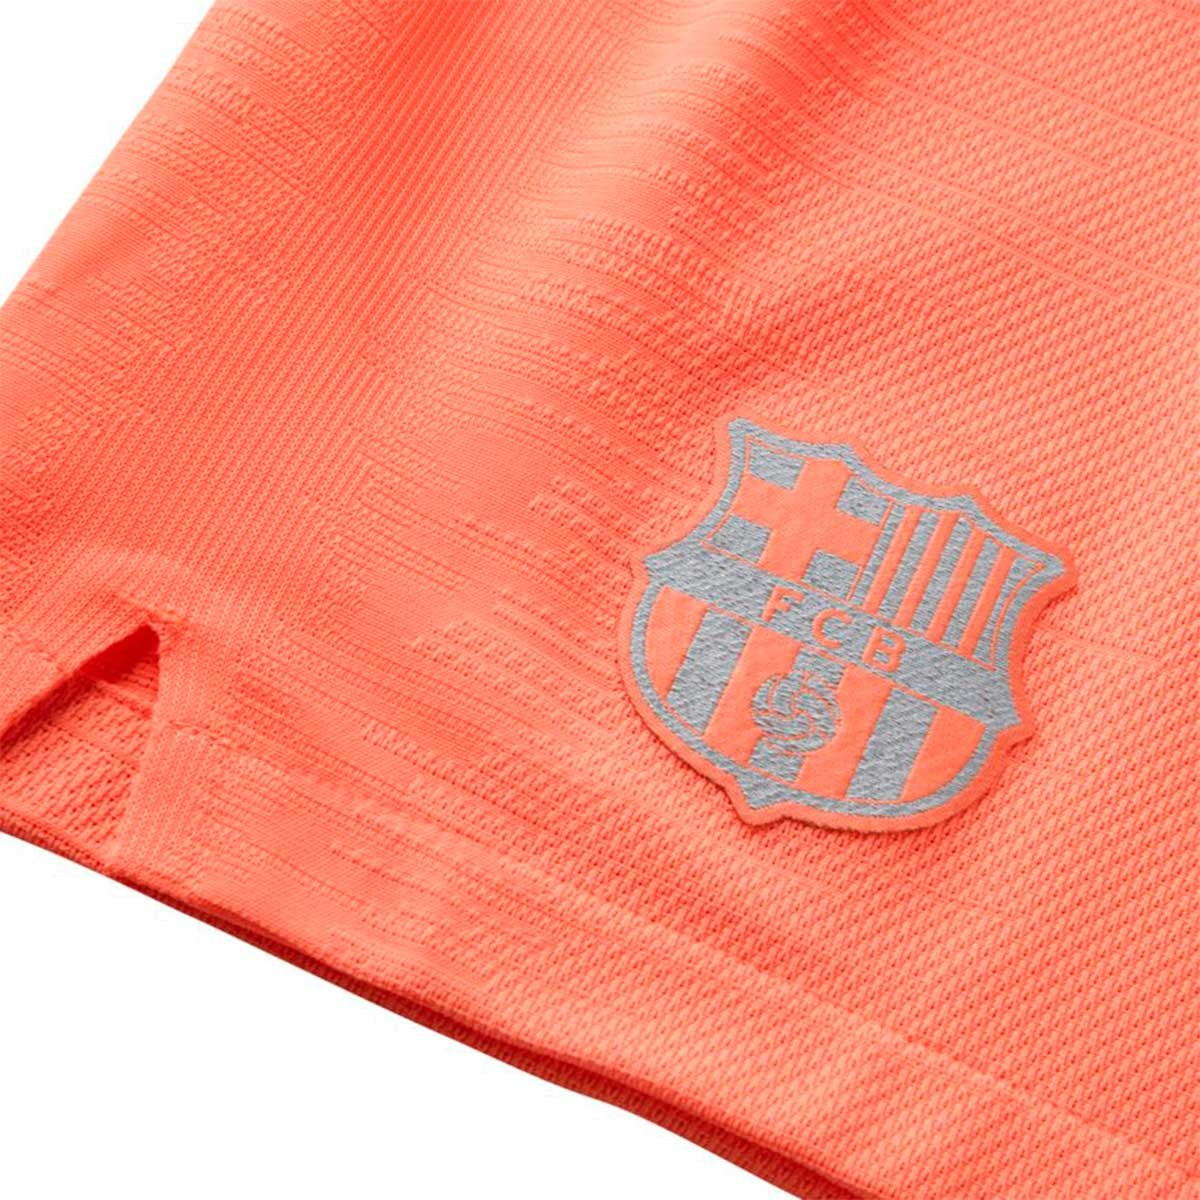 40c628f5f Shorts Nike Vapor FC Barcelona Match 2018-2019 Third Light atomic pink- Silver - Football store Fútbol Emotion